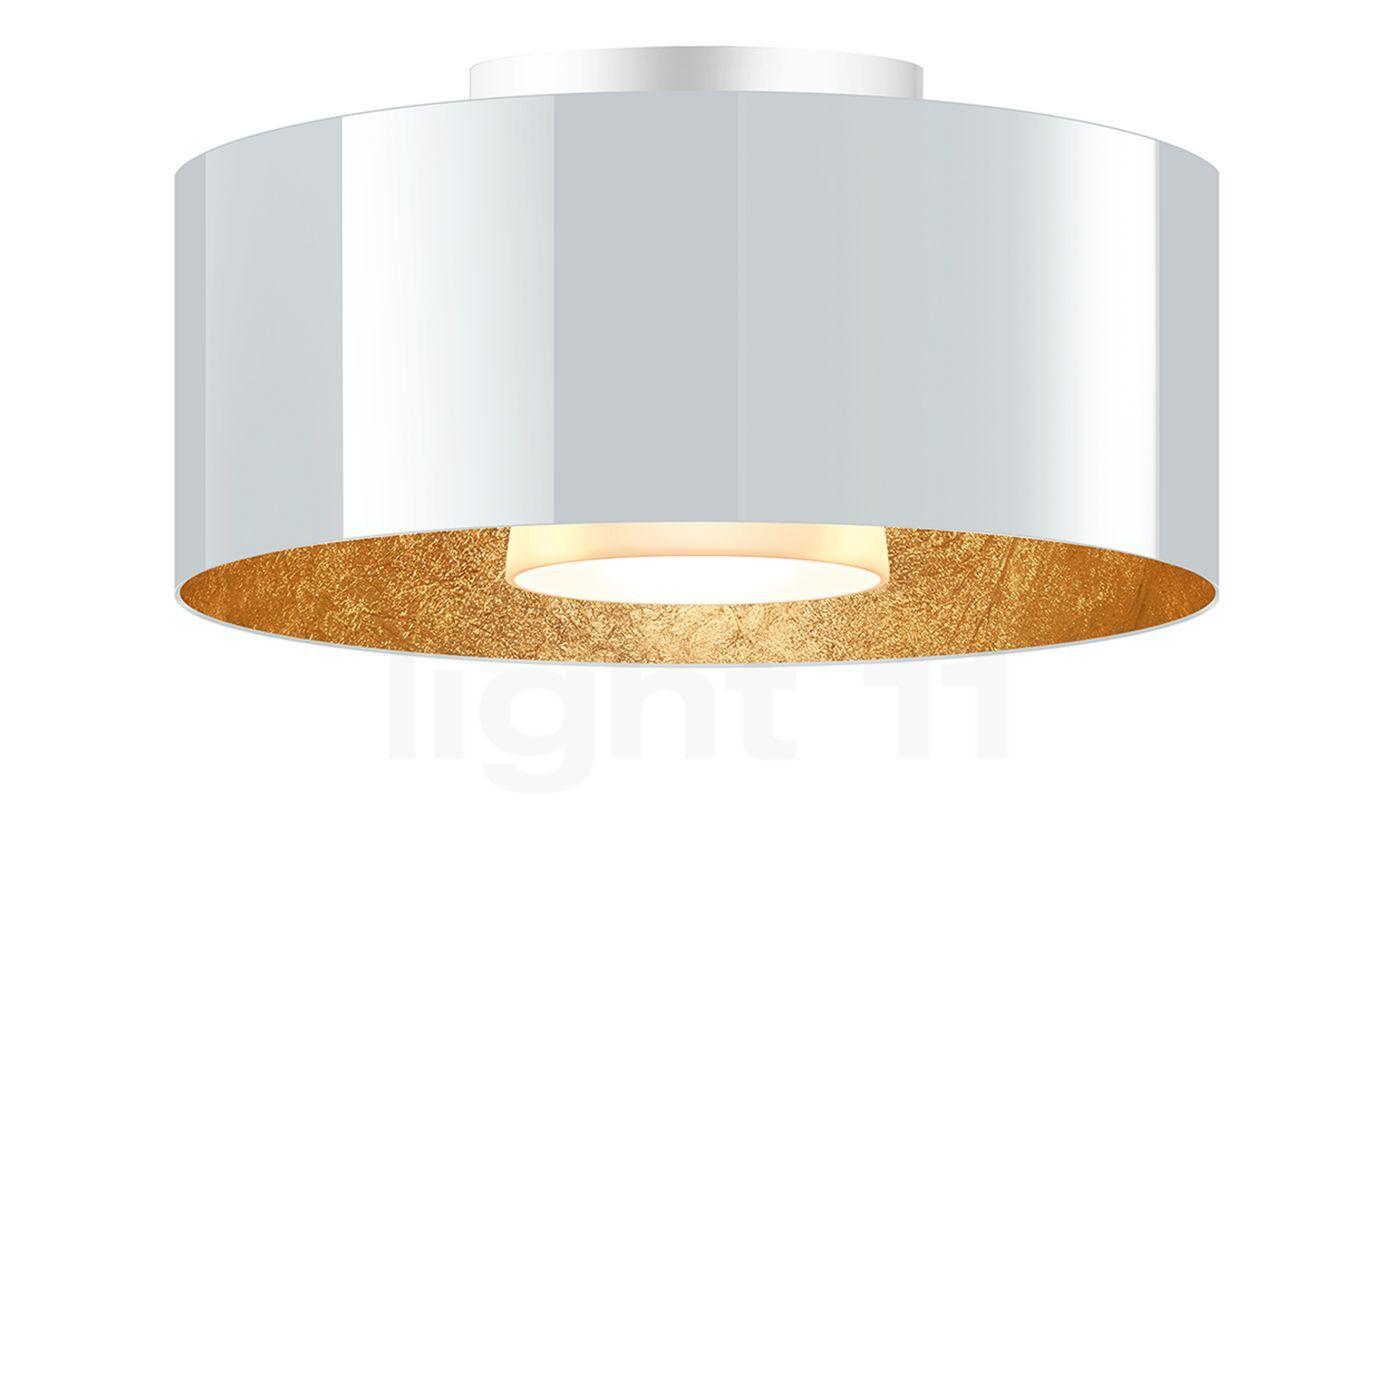 Bruck Cantara Plafonnier LED - ø30 cm, blanc/doré , Vente d'entrepôt, neuf, emballage d'origine